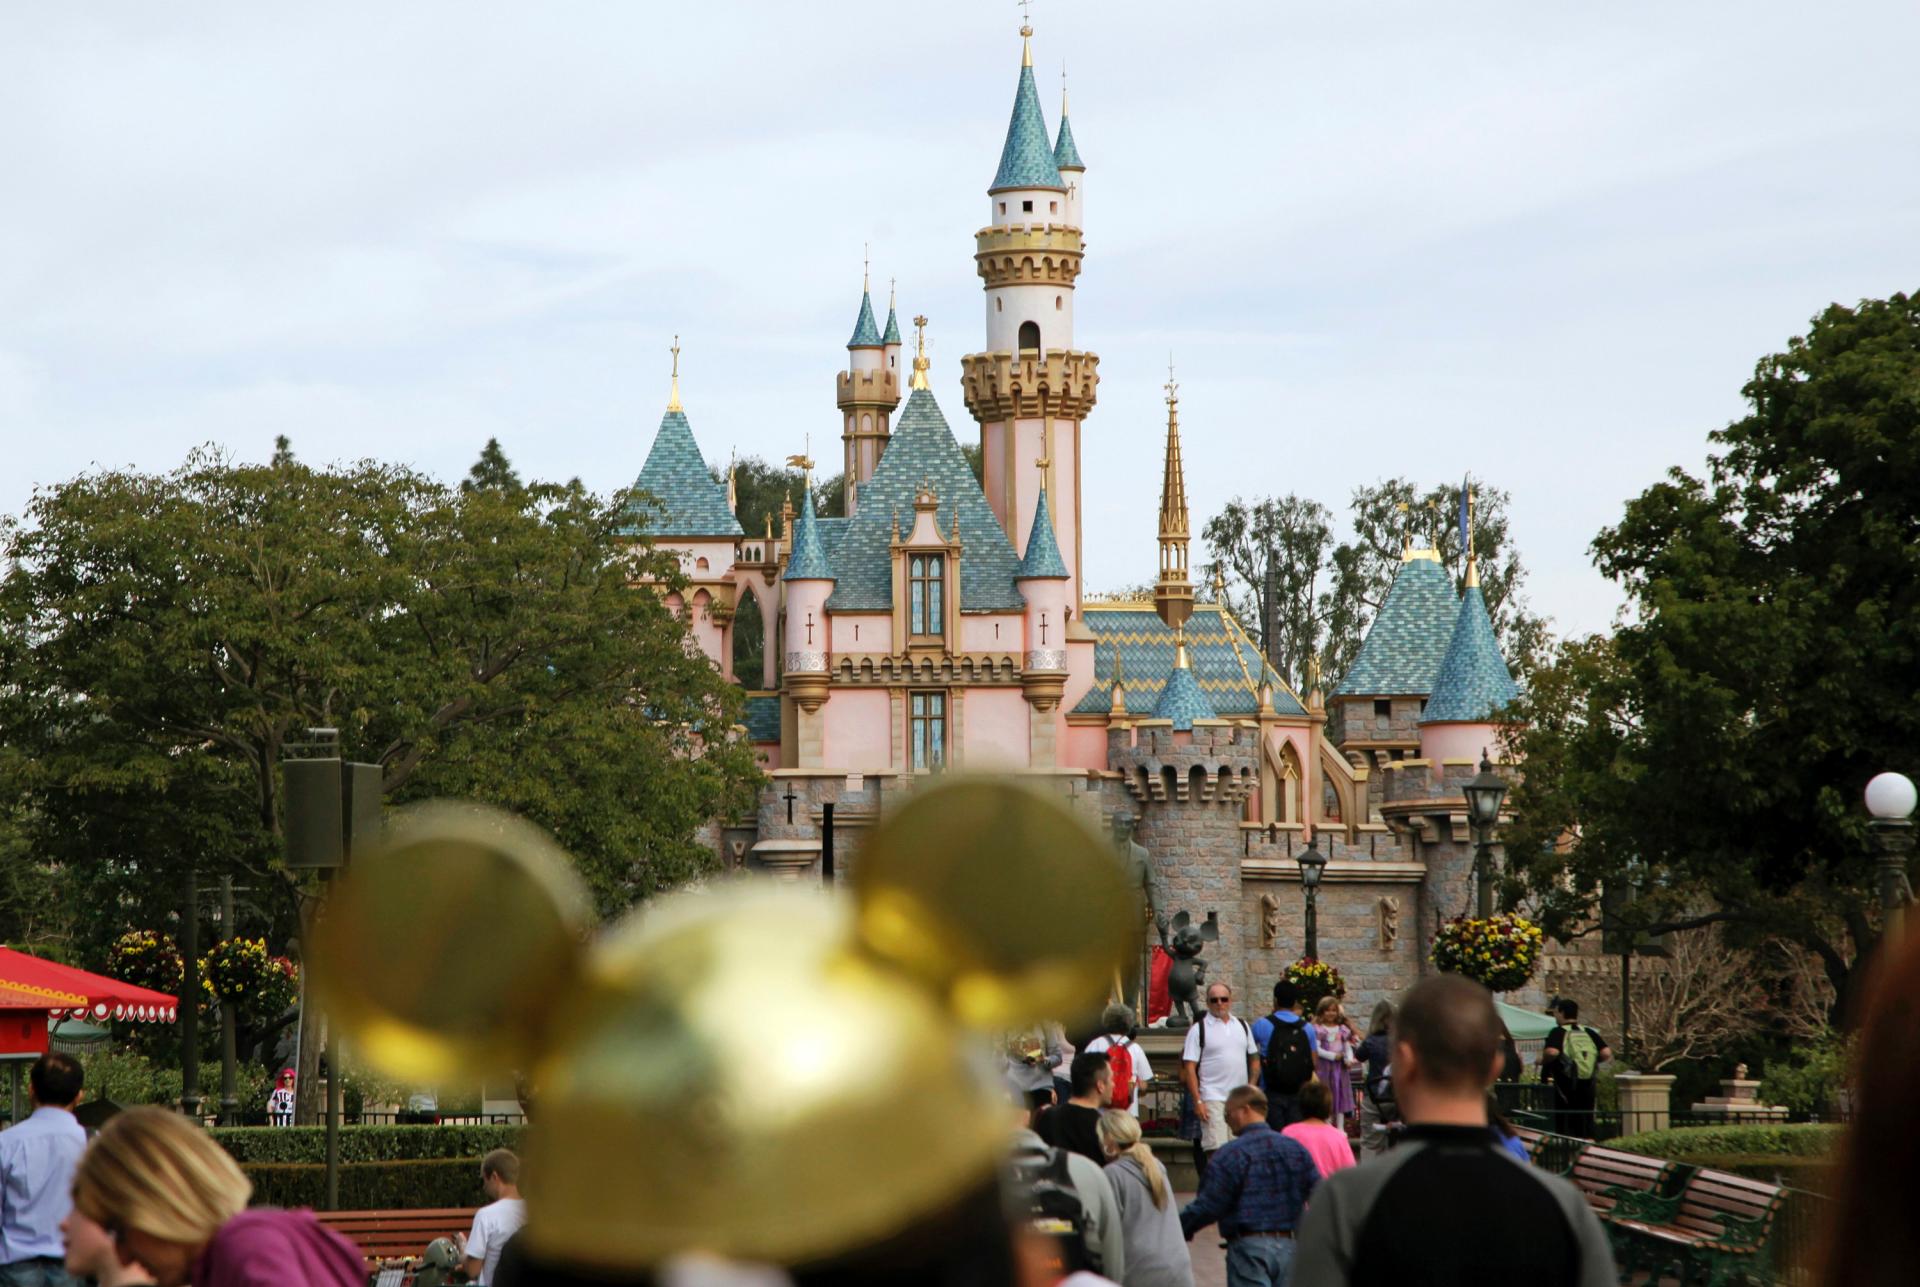 Disneyland announces increase in ticket prices, passes $200 mark